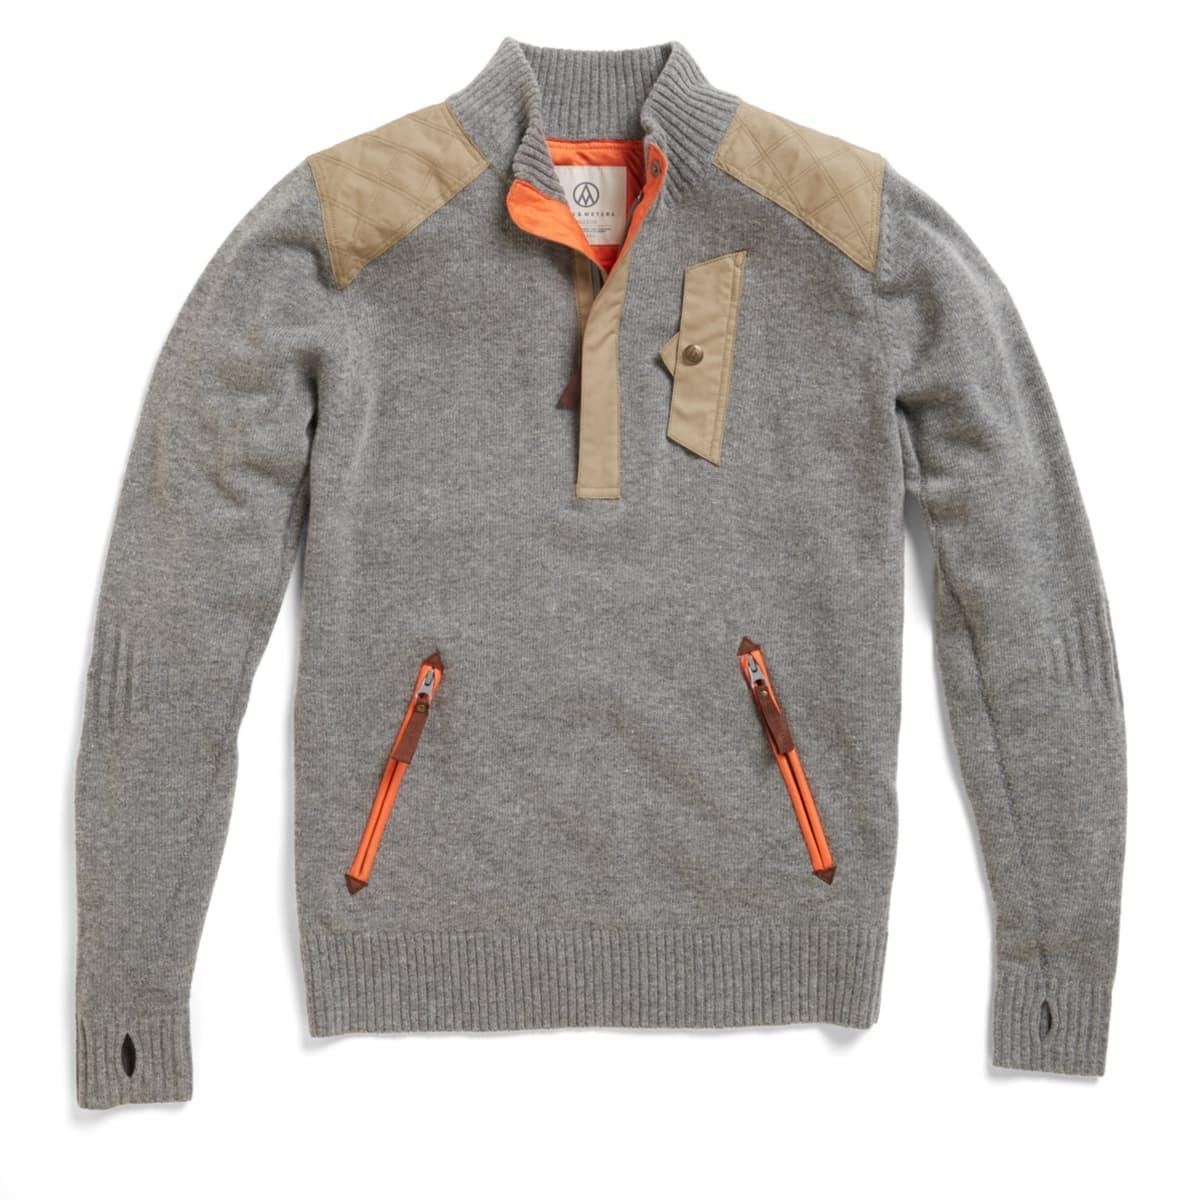 W58xxlnssx alps meters alpine guide sweater 0 original